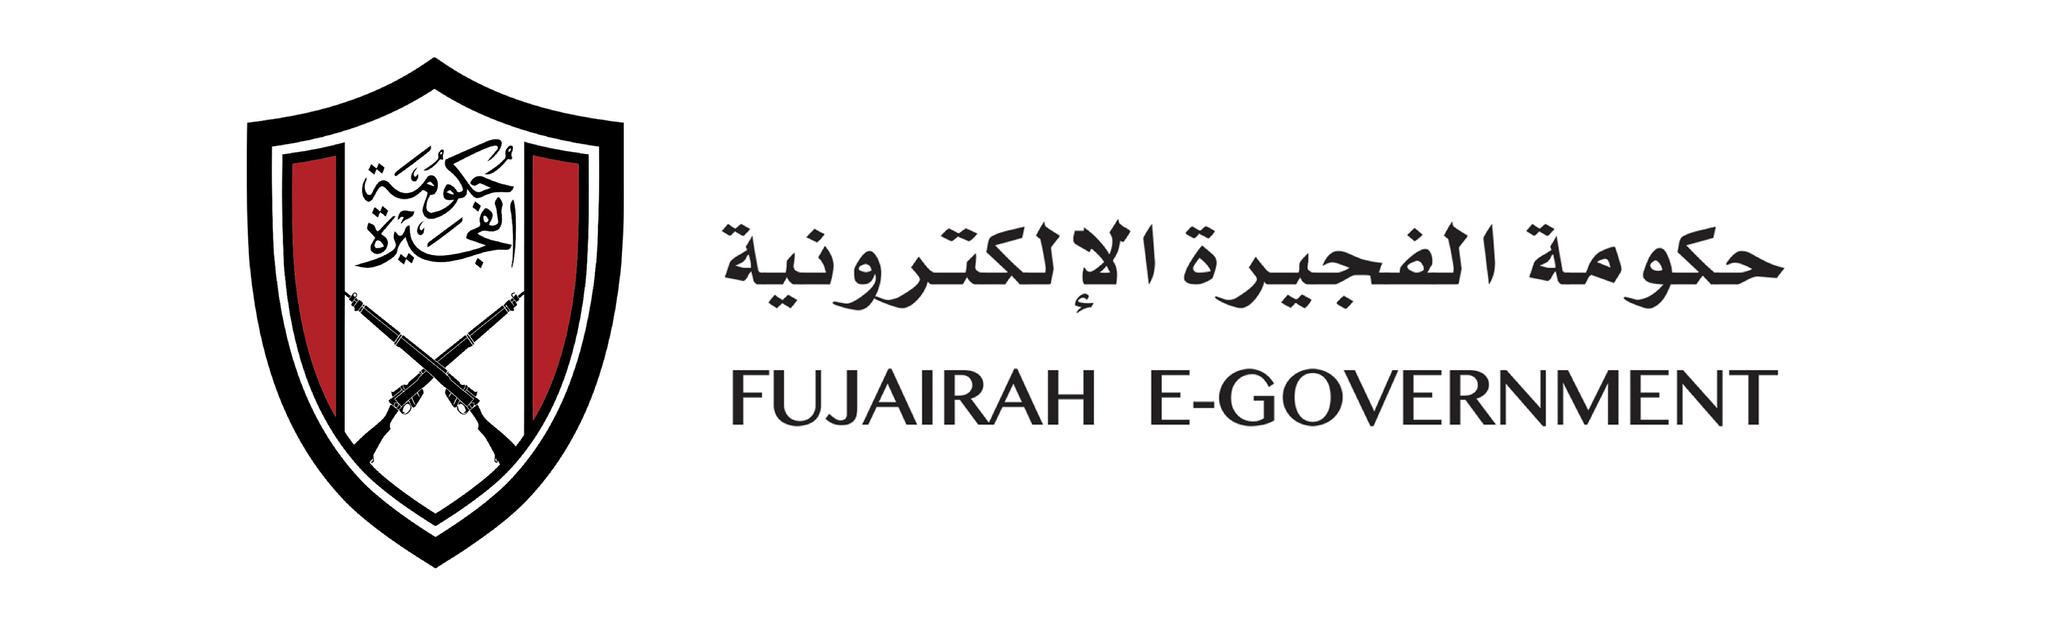 Government Of Fujairah